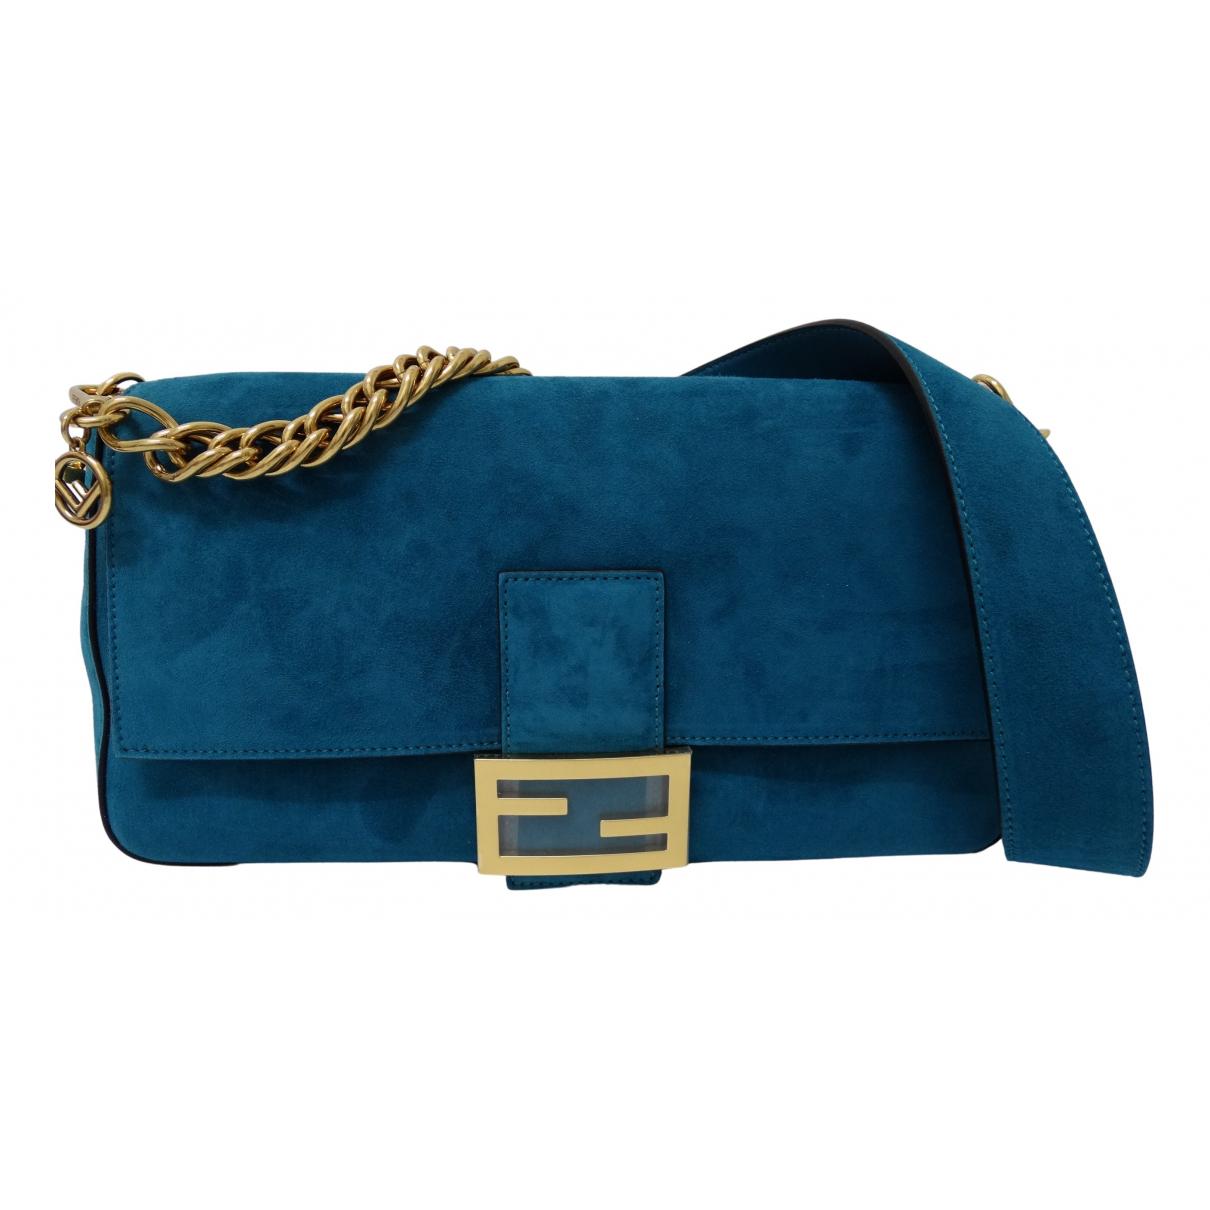 Fendi N Blue Suede handbag for Women N